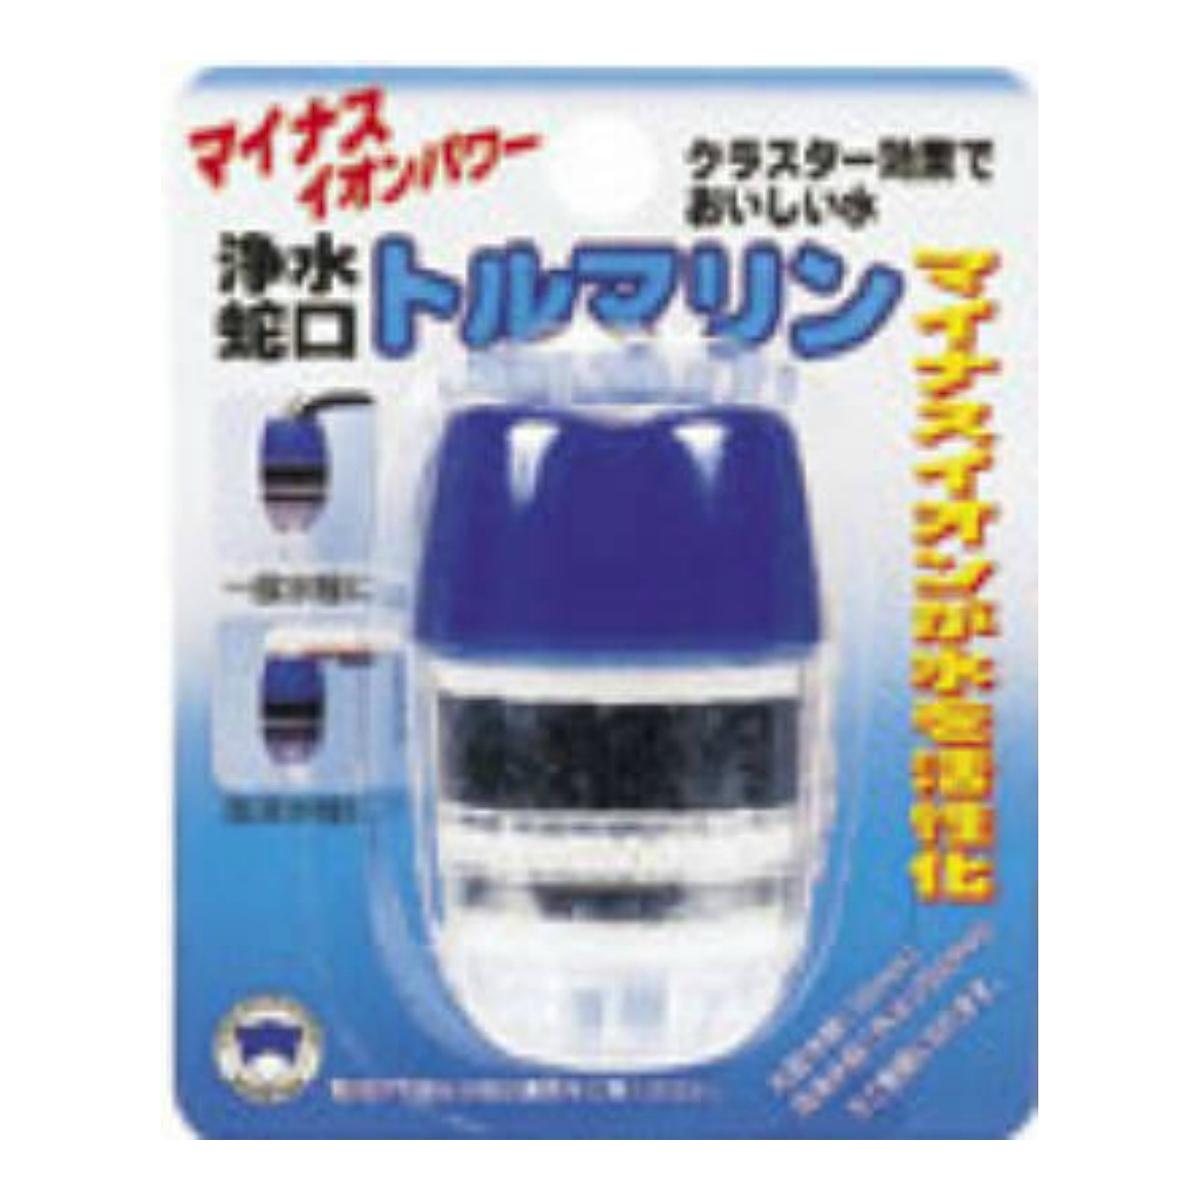 Bonn star sale clean water faucet tourmaline (the water purifier faucet direct connection type body) *5 point set (4902493202267)